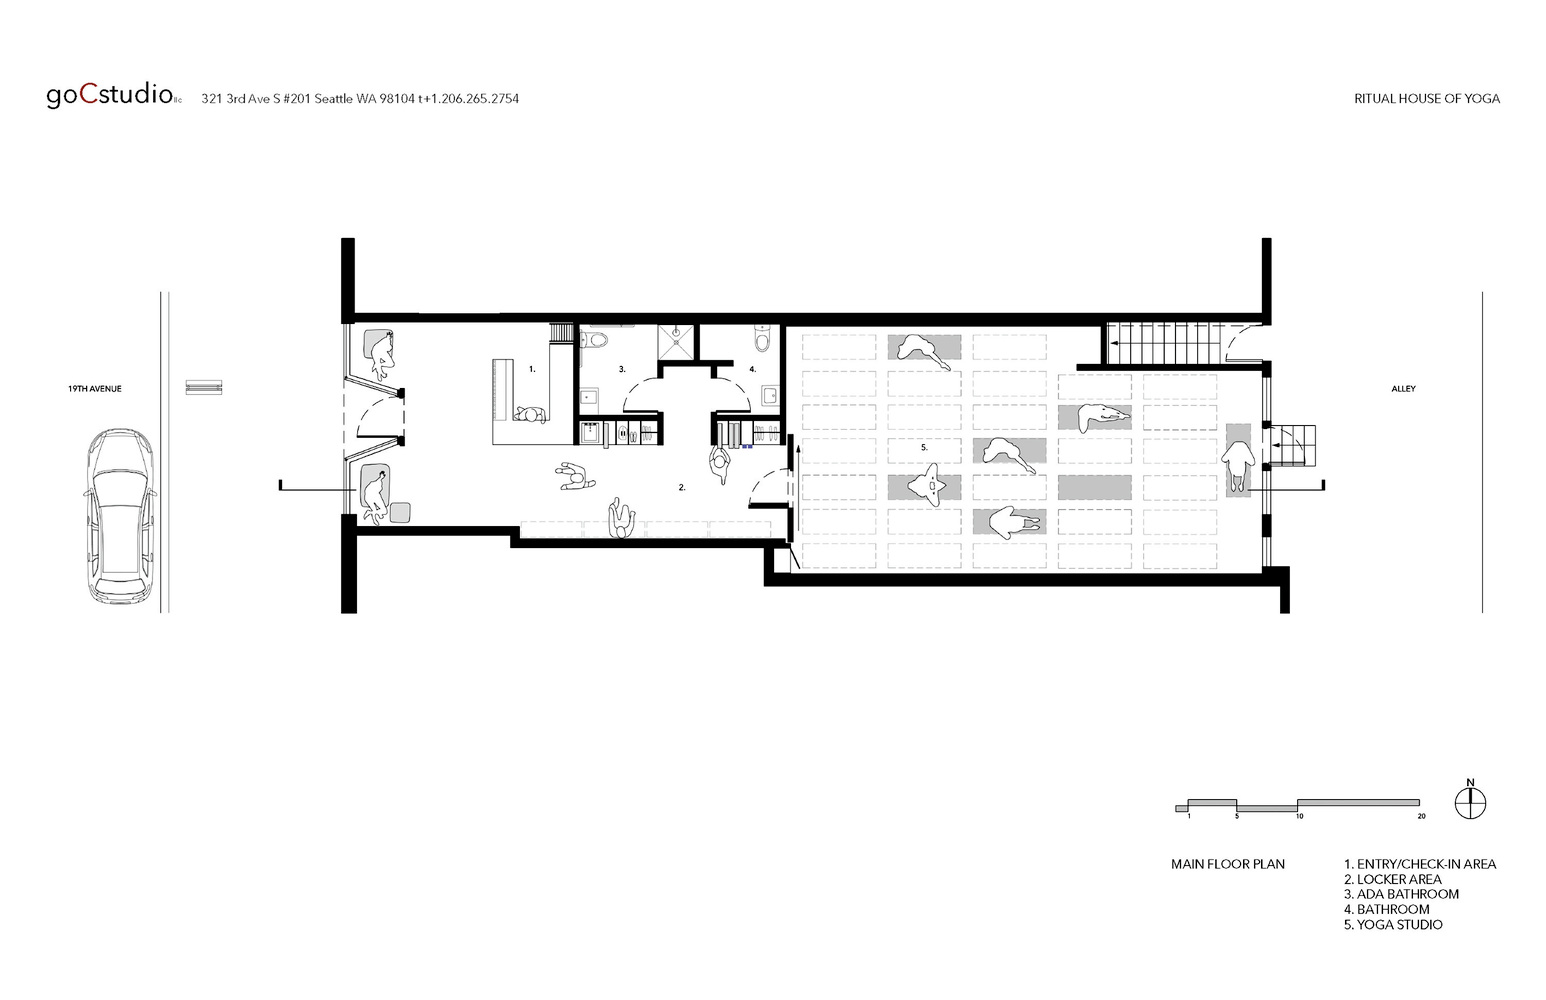 Ritual House Of Yoga Floor Plan